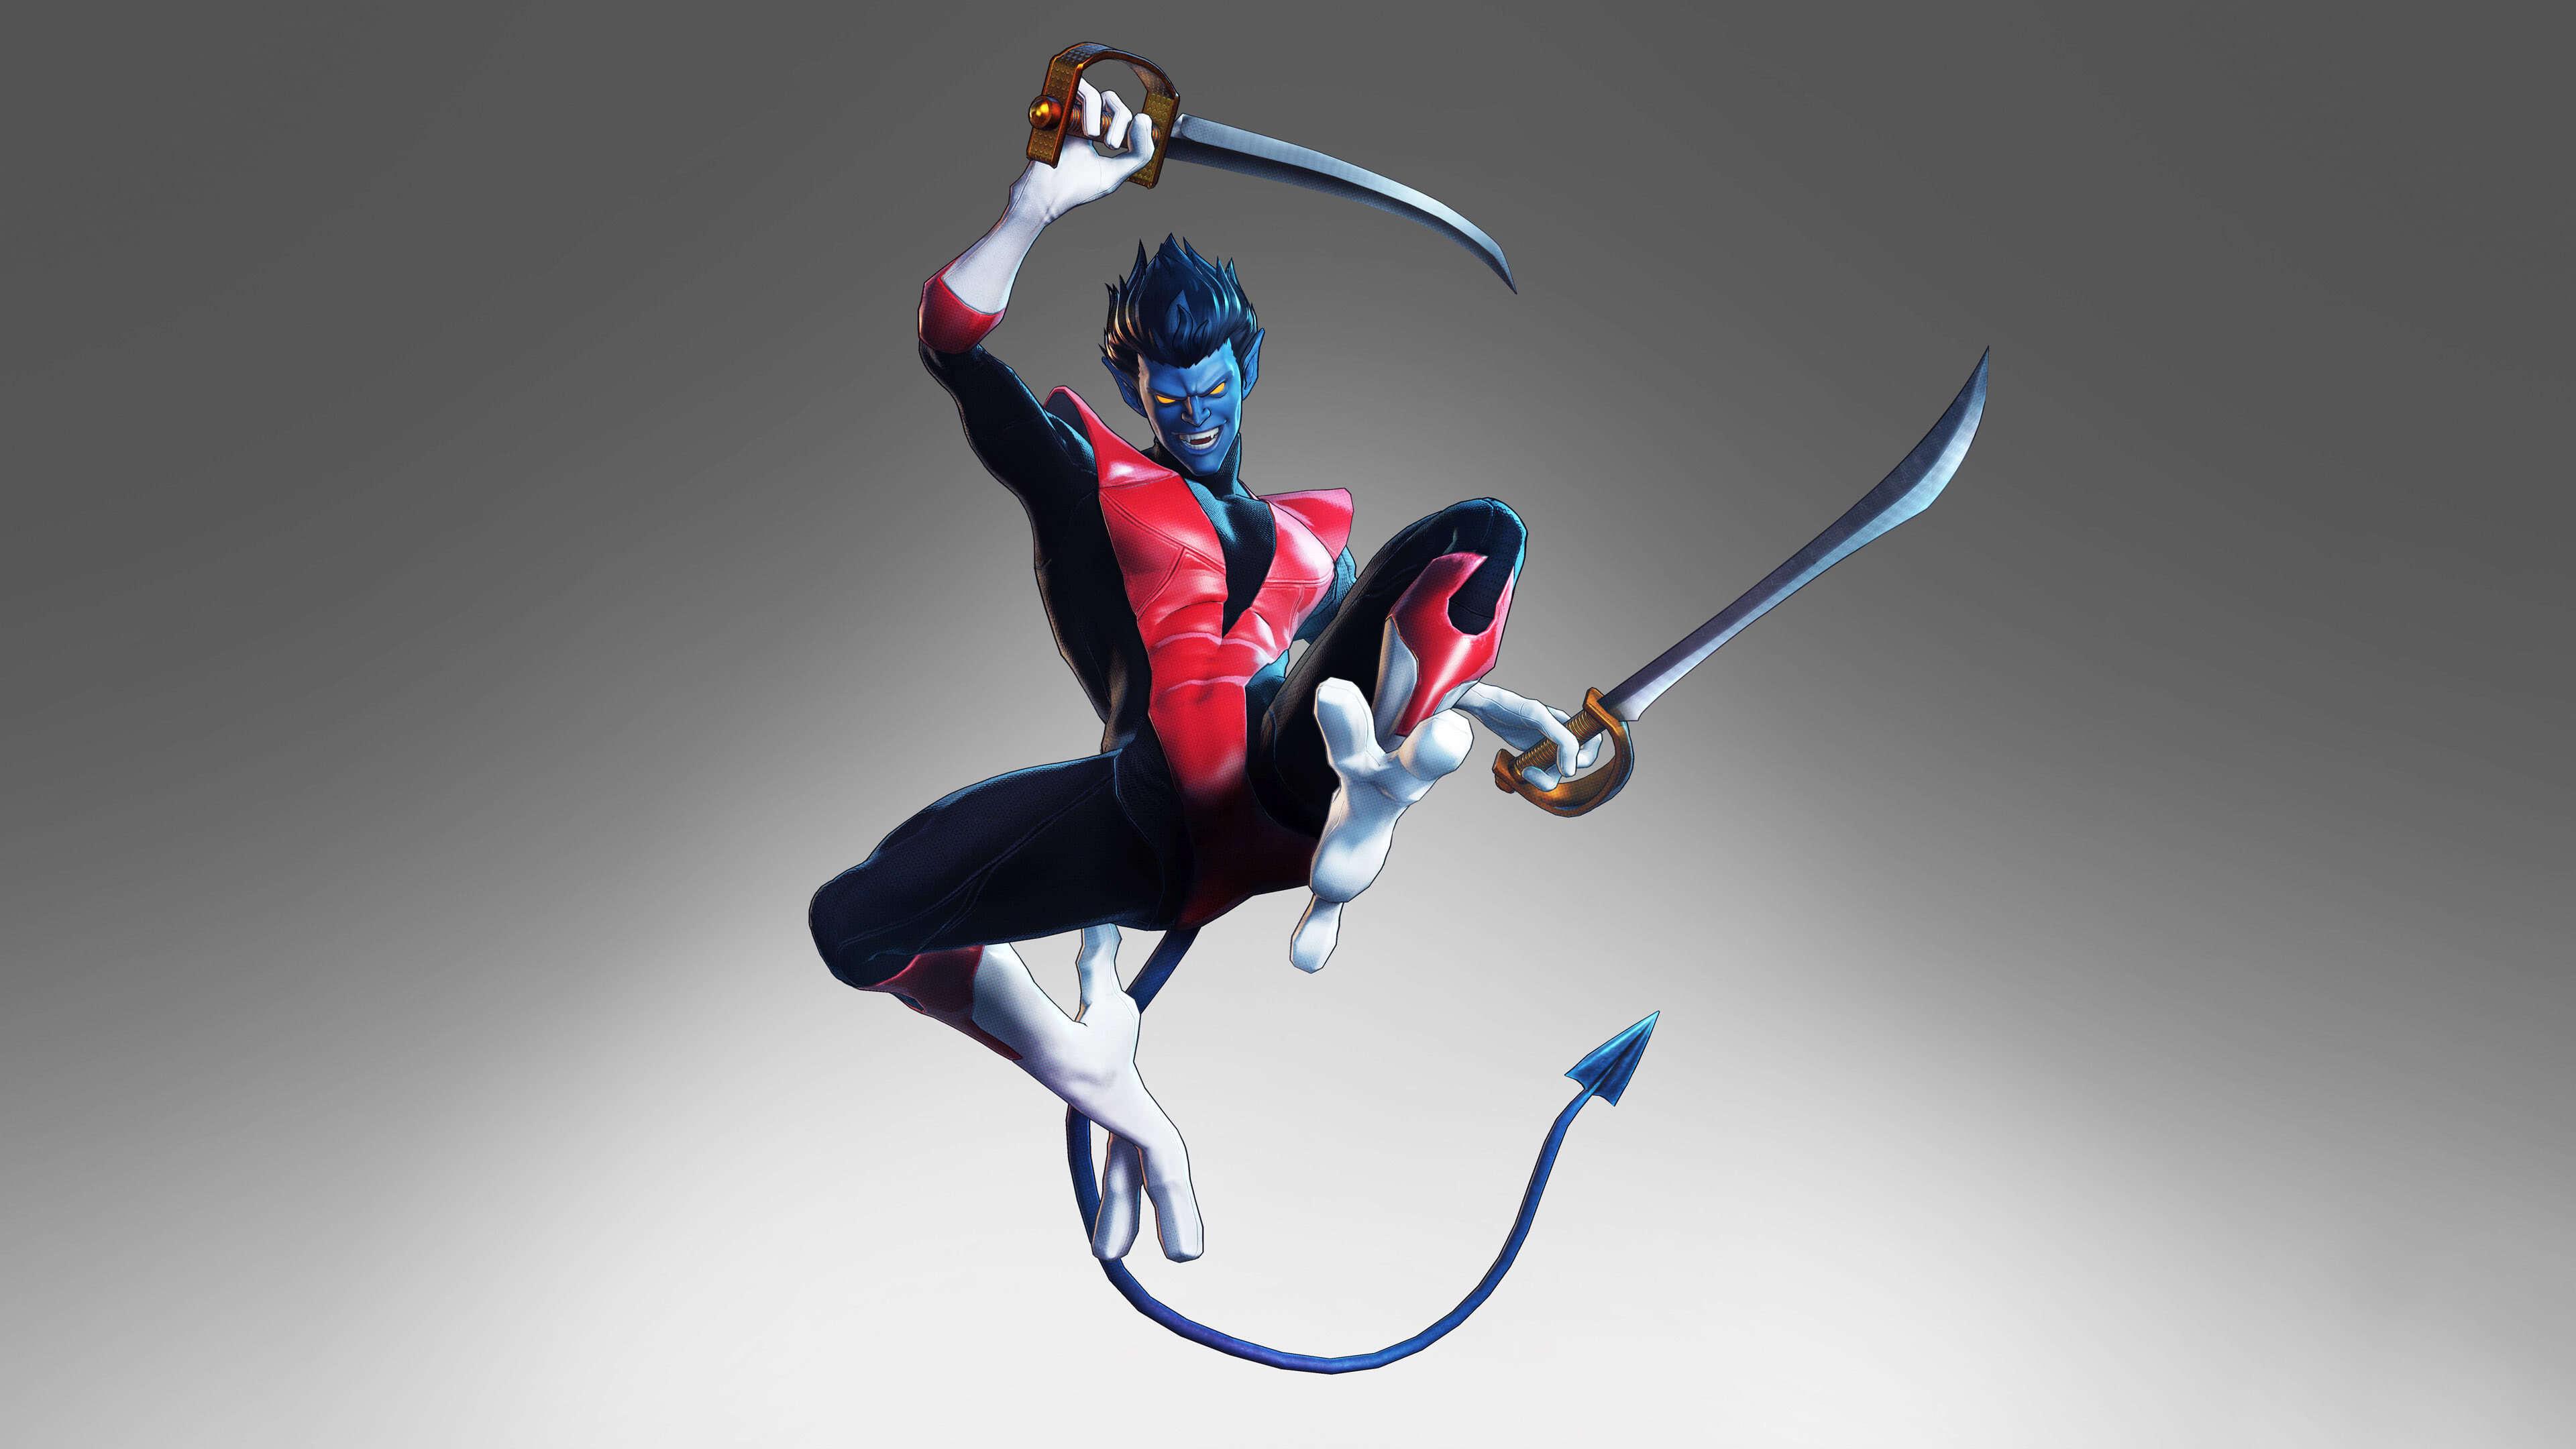 Marvel Ultimate Alliance 3 Nightcrawler Uhd 4k Wallpaper Pixelz